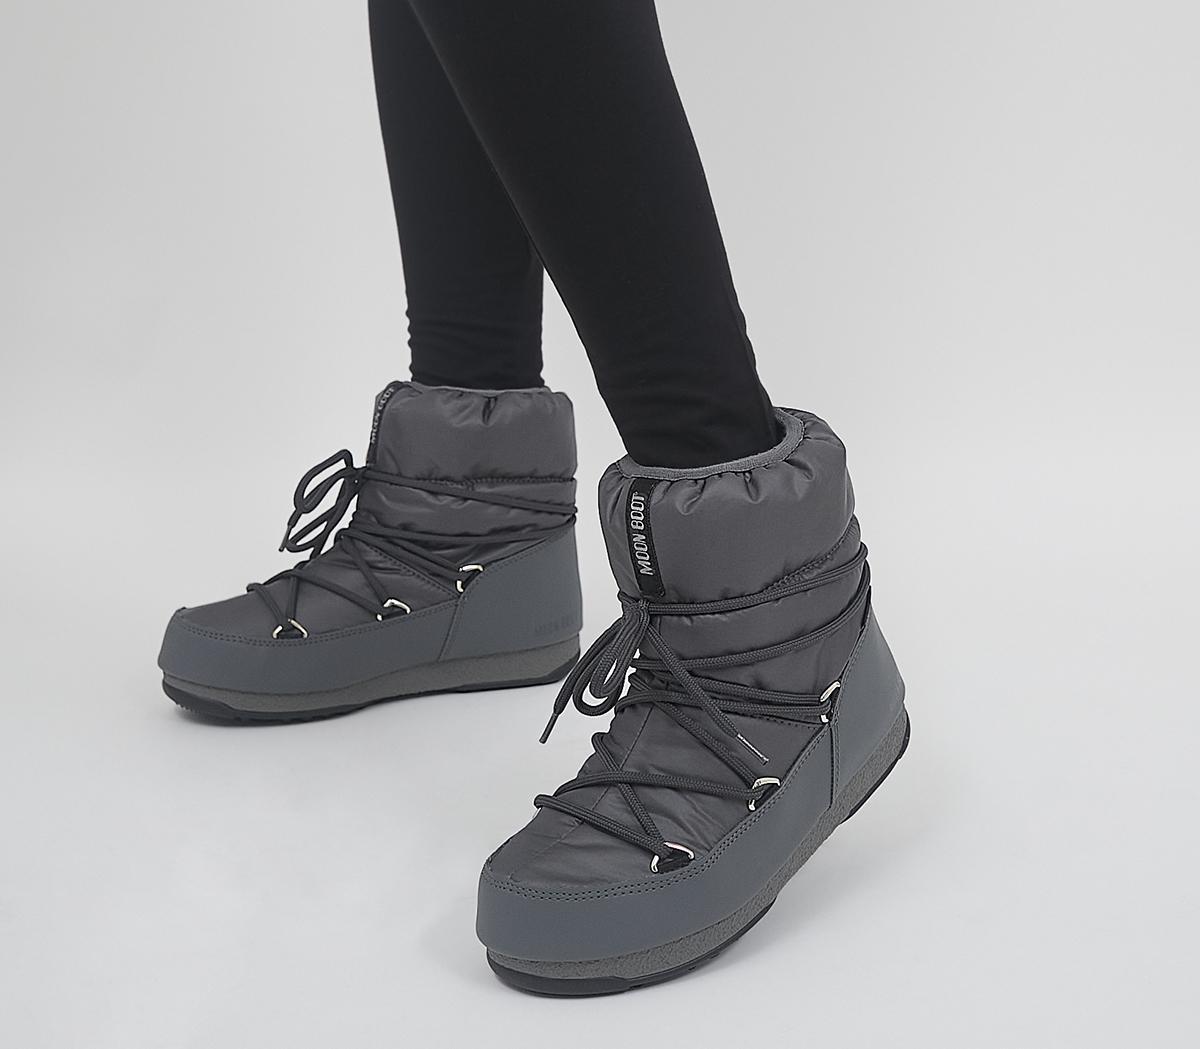 Moon Boots Low Nylon Wp 2